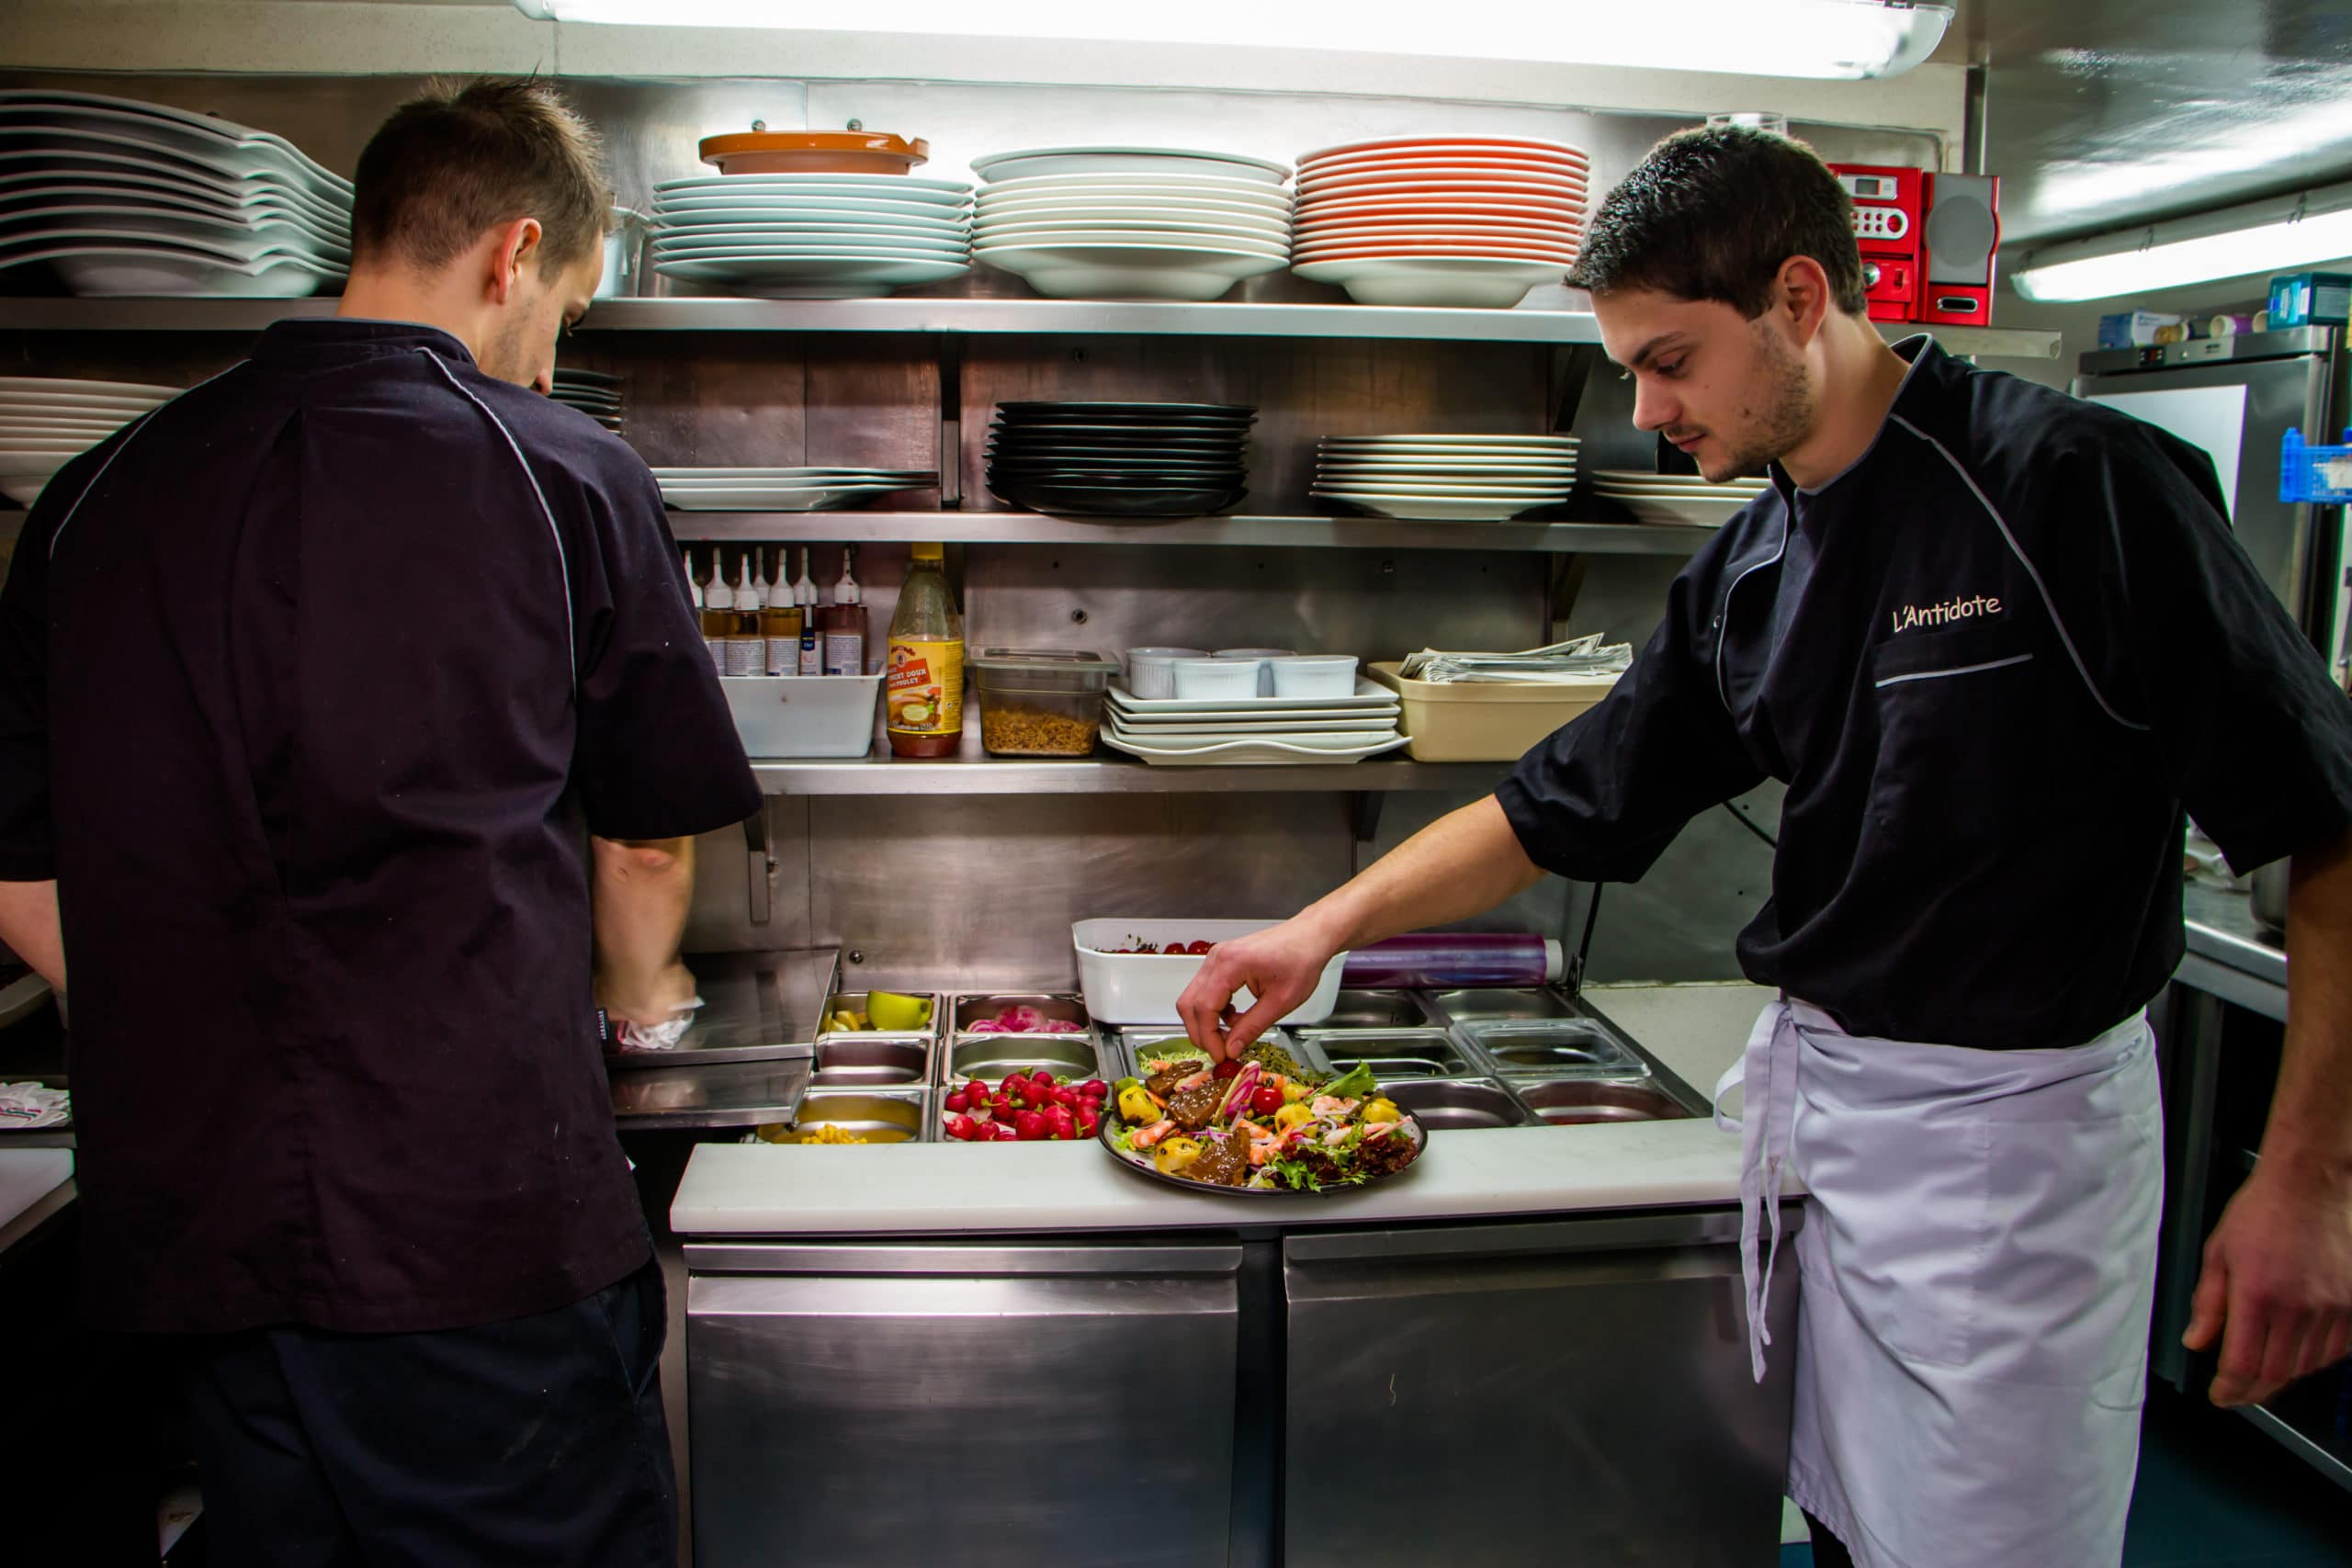 restaurant-cherbourg-l-antidote-equipe-produits-frais-romain-bourdet©mathildemochon